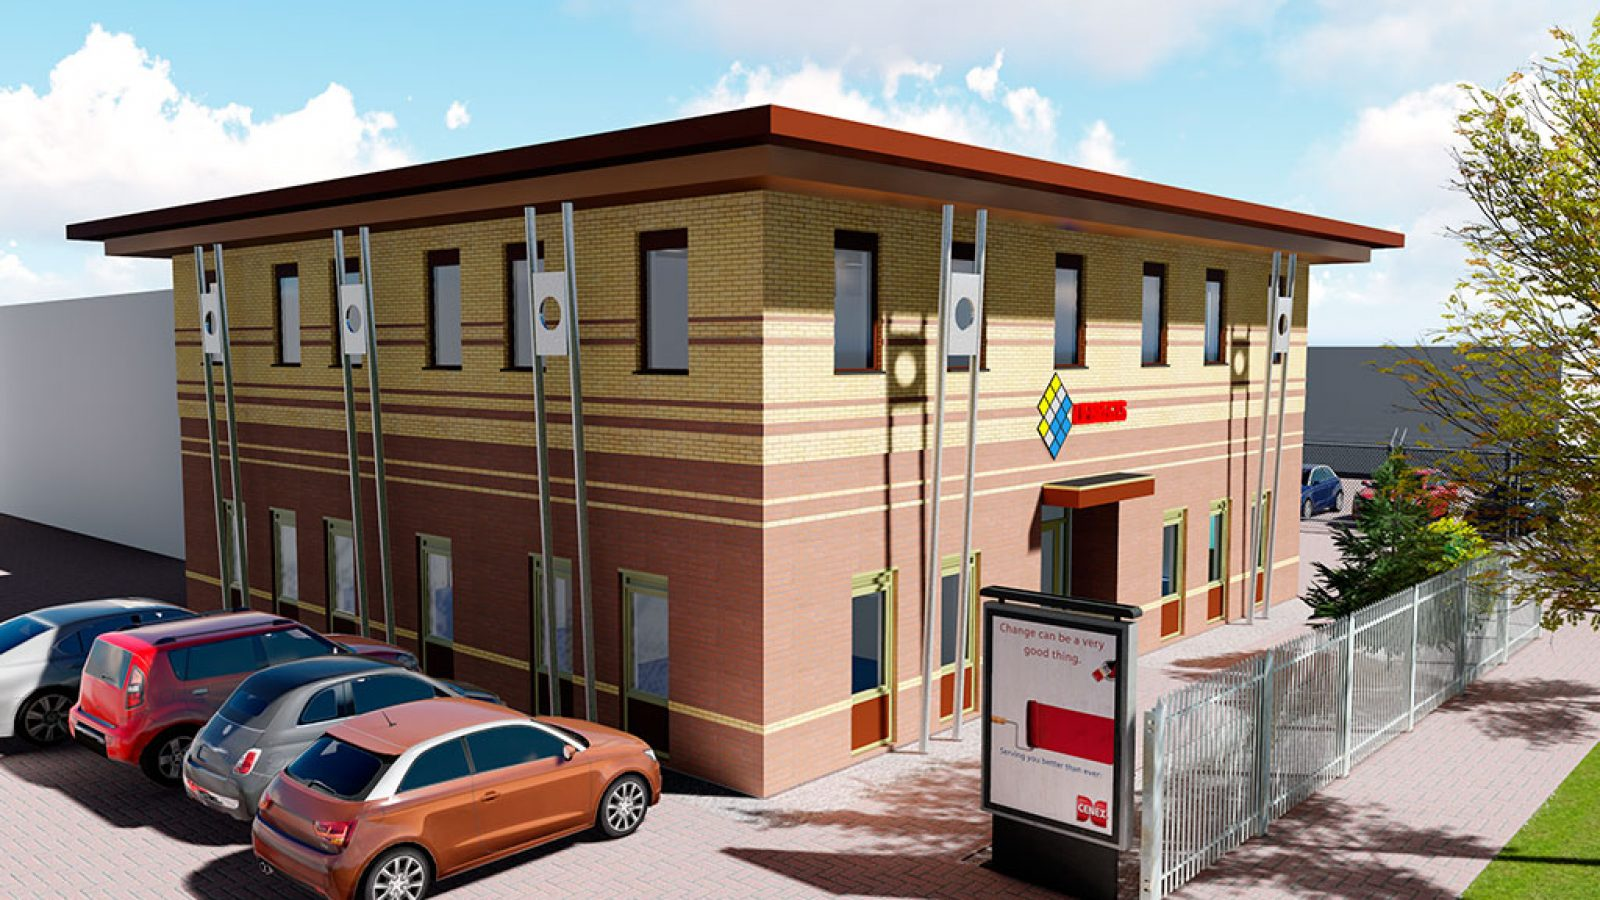 Modelado BIM Edificio oficinas. Eindhoven